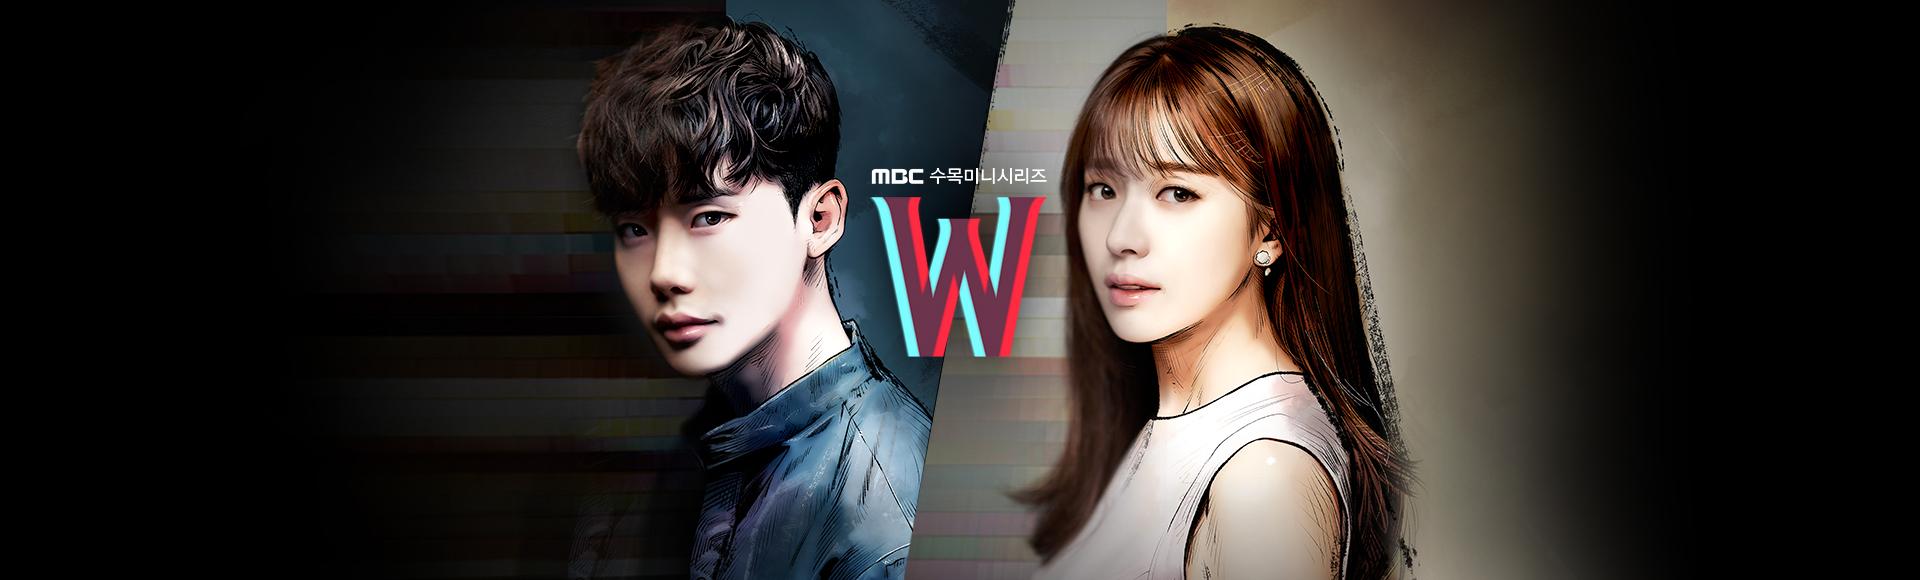 MBC 수목미니시리즈 W 이종석, 한효주